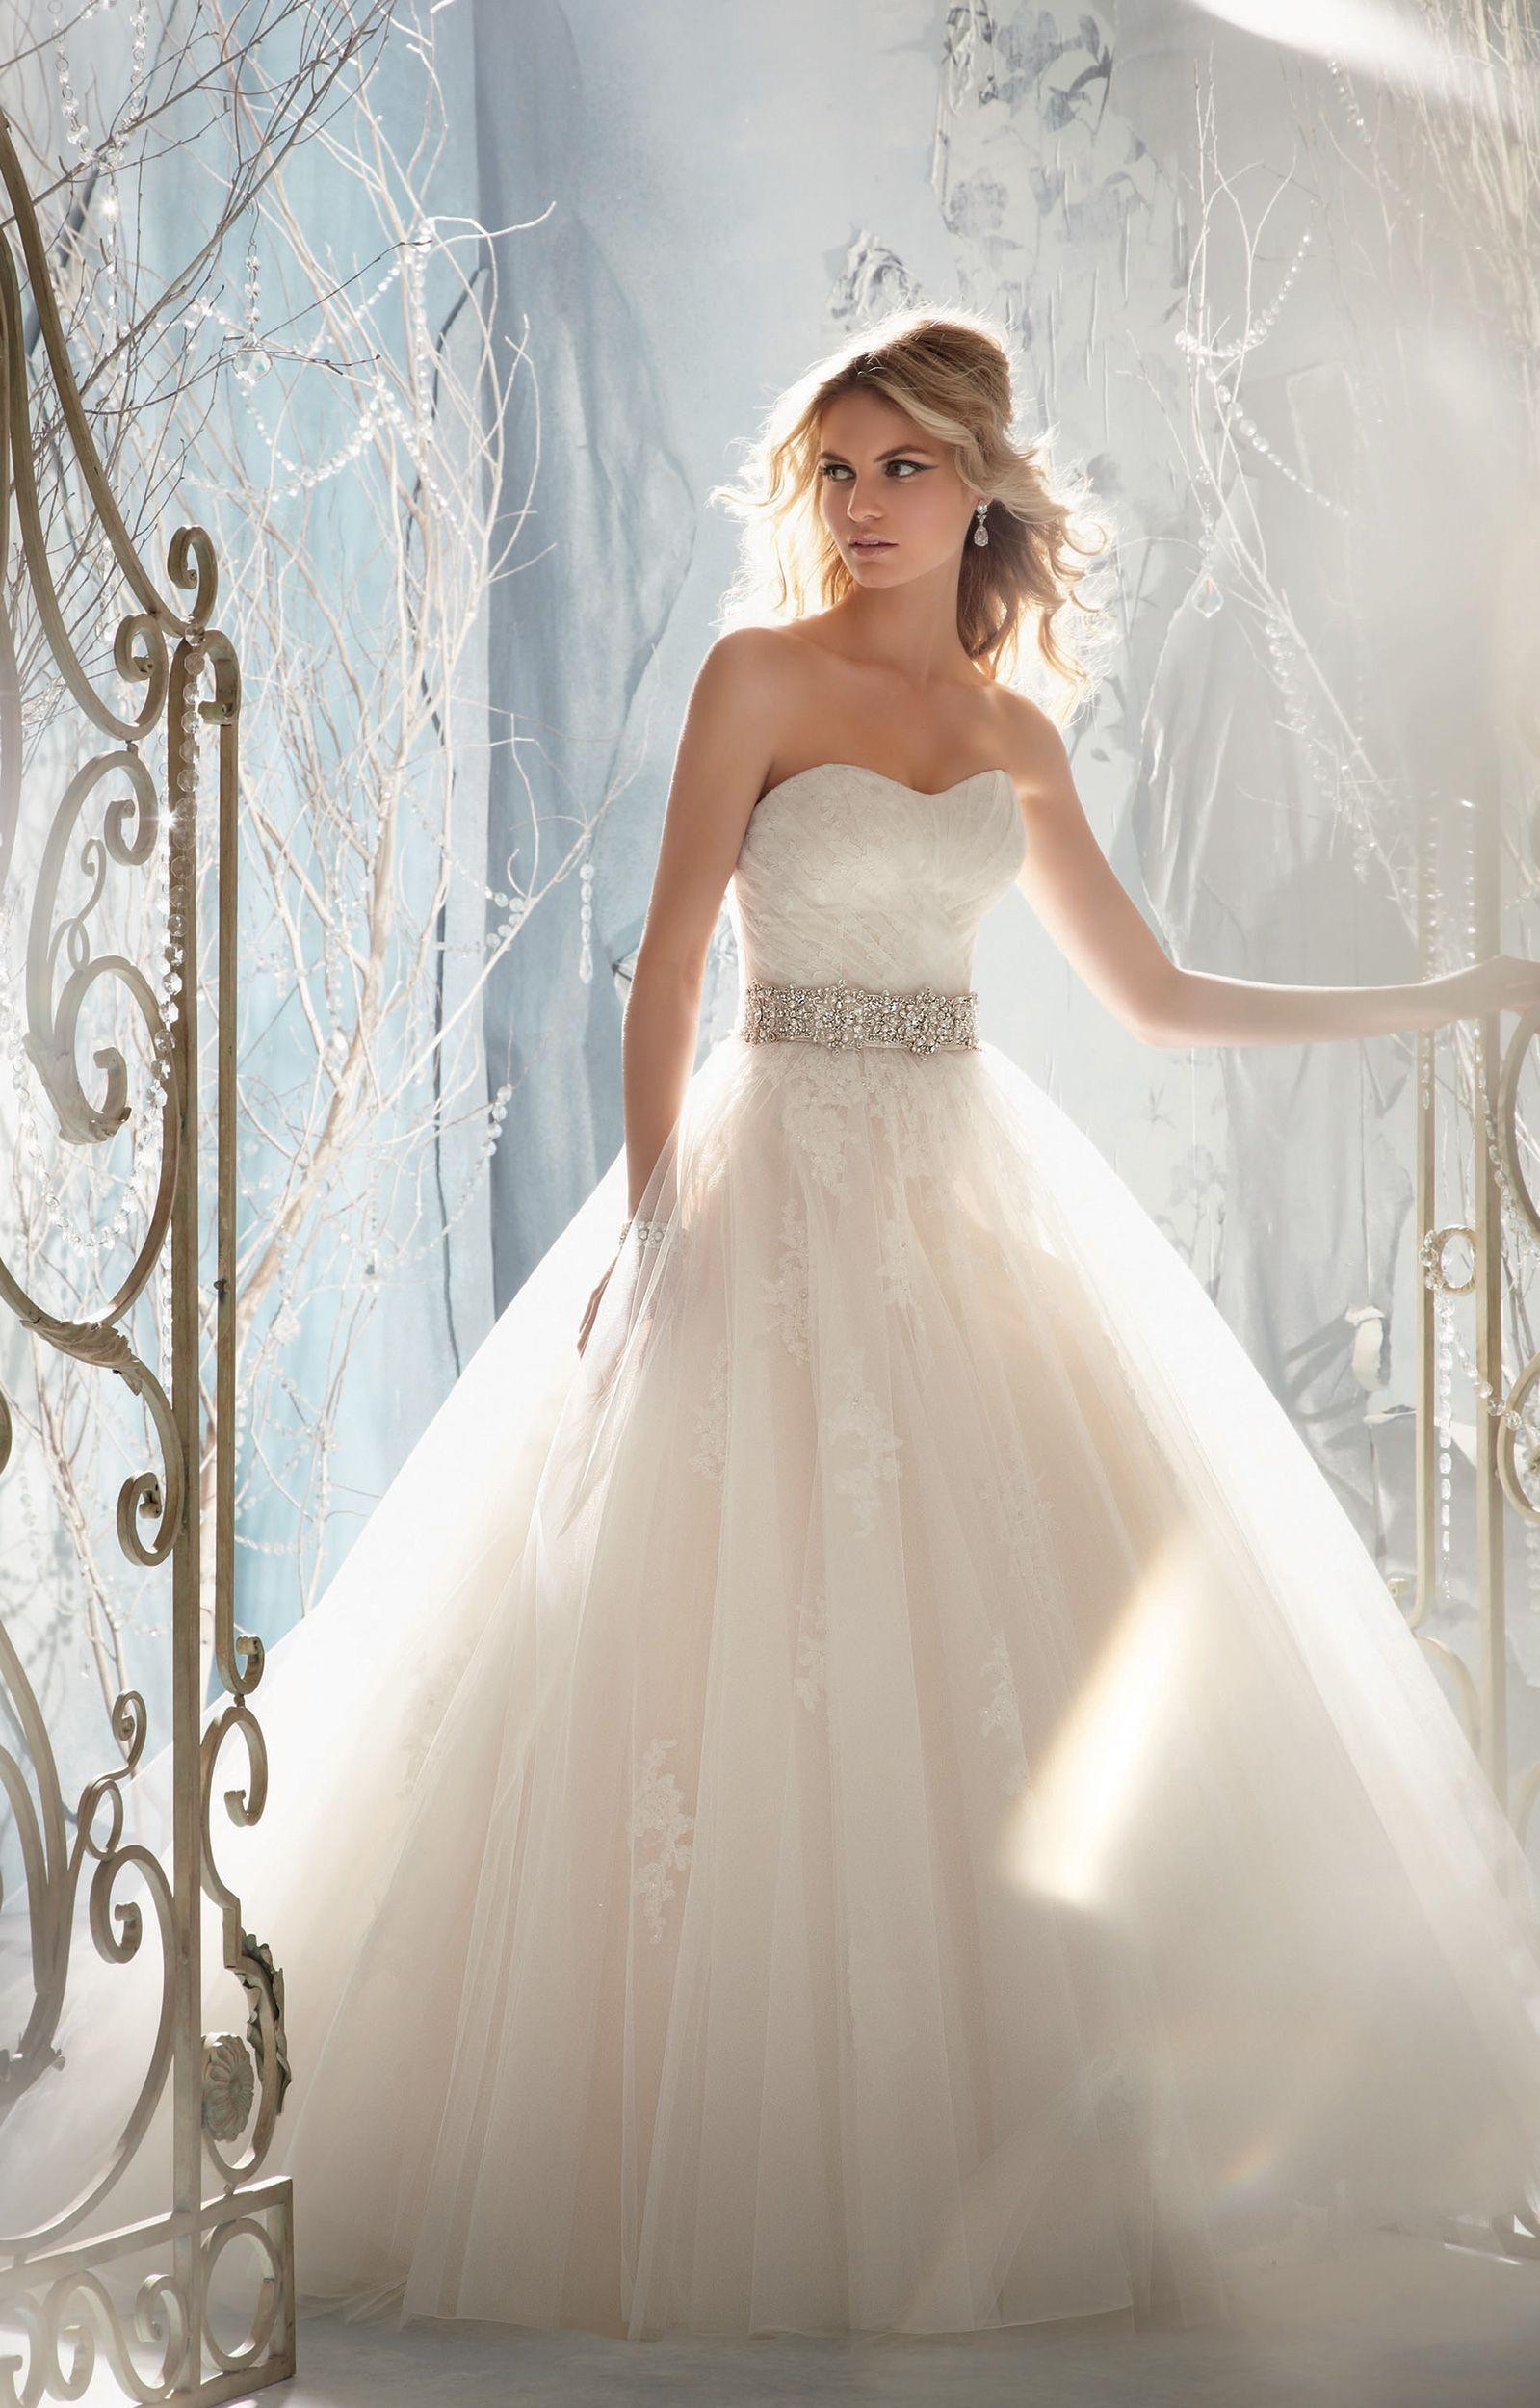 Pin by Bernita Matory on Wedding!!! | Pinterest | Fairytale weddings ...